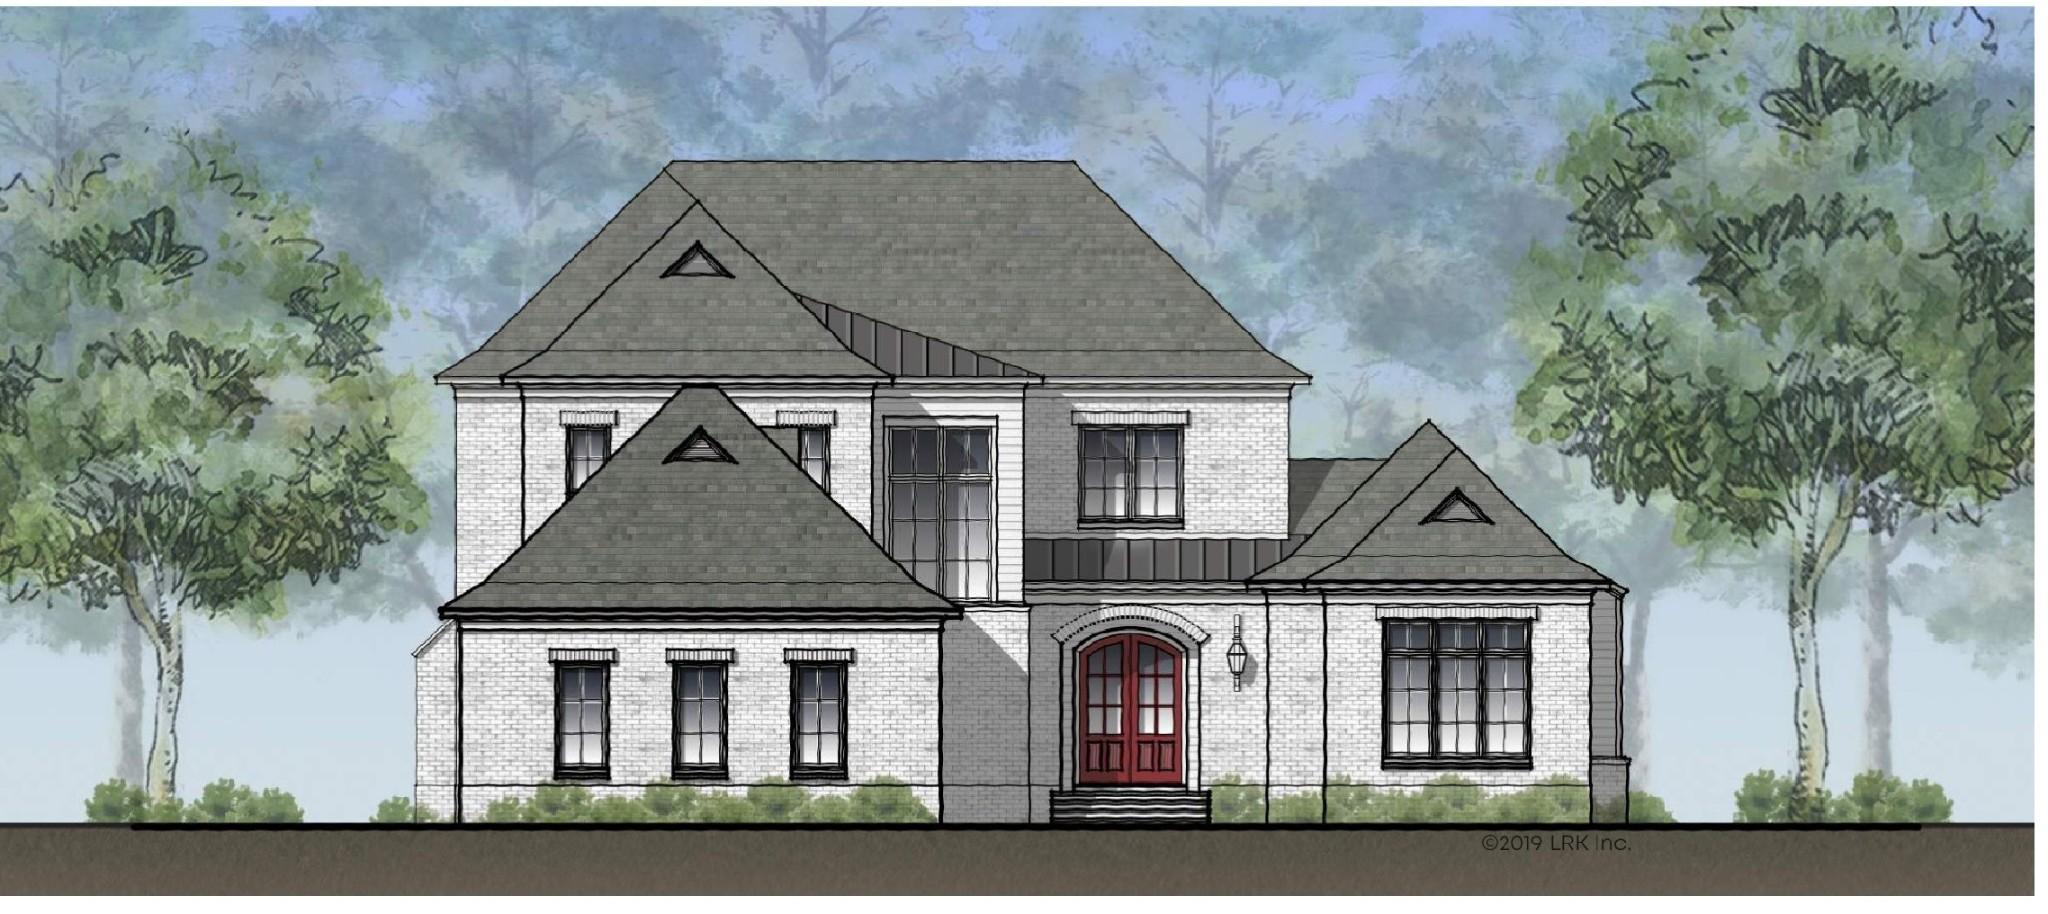 136 Glenrock Dr, Bellevue, Tennessee 5 Bedroom as one of Homes & Land Real Estate